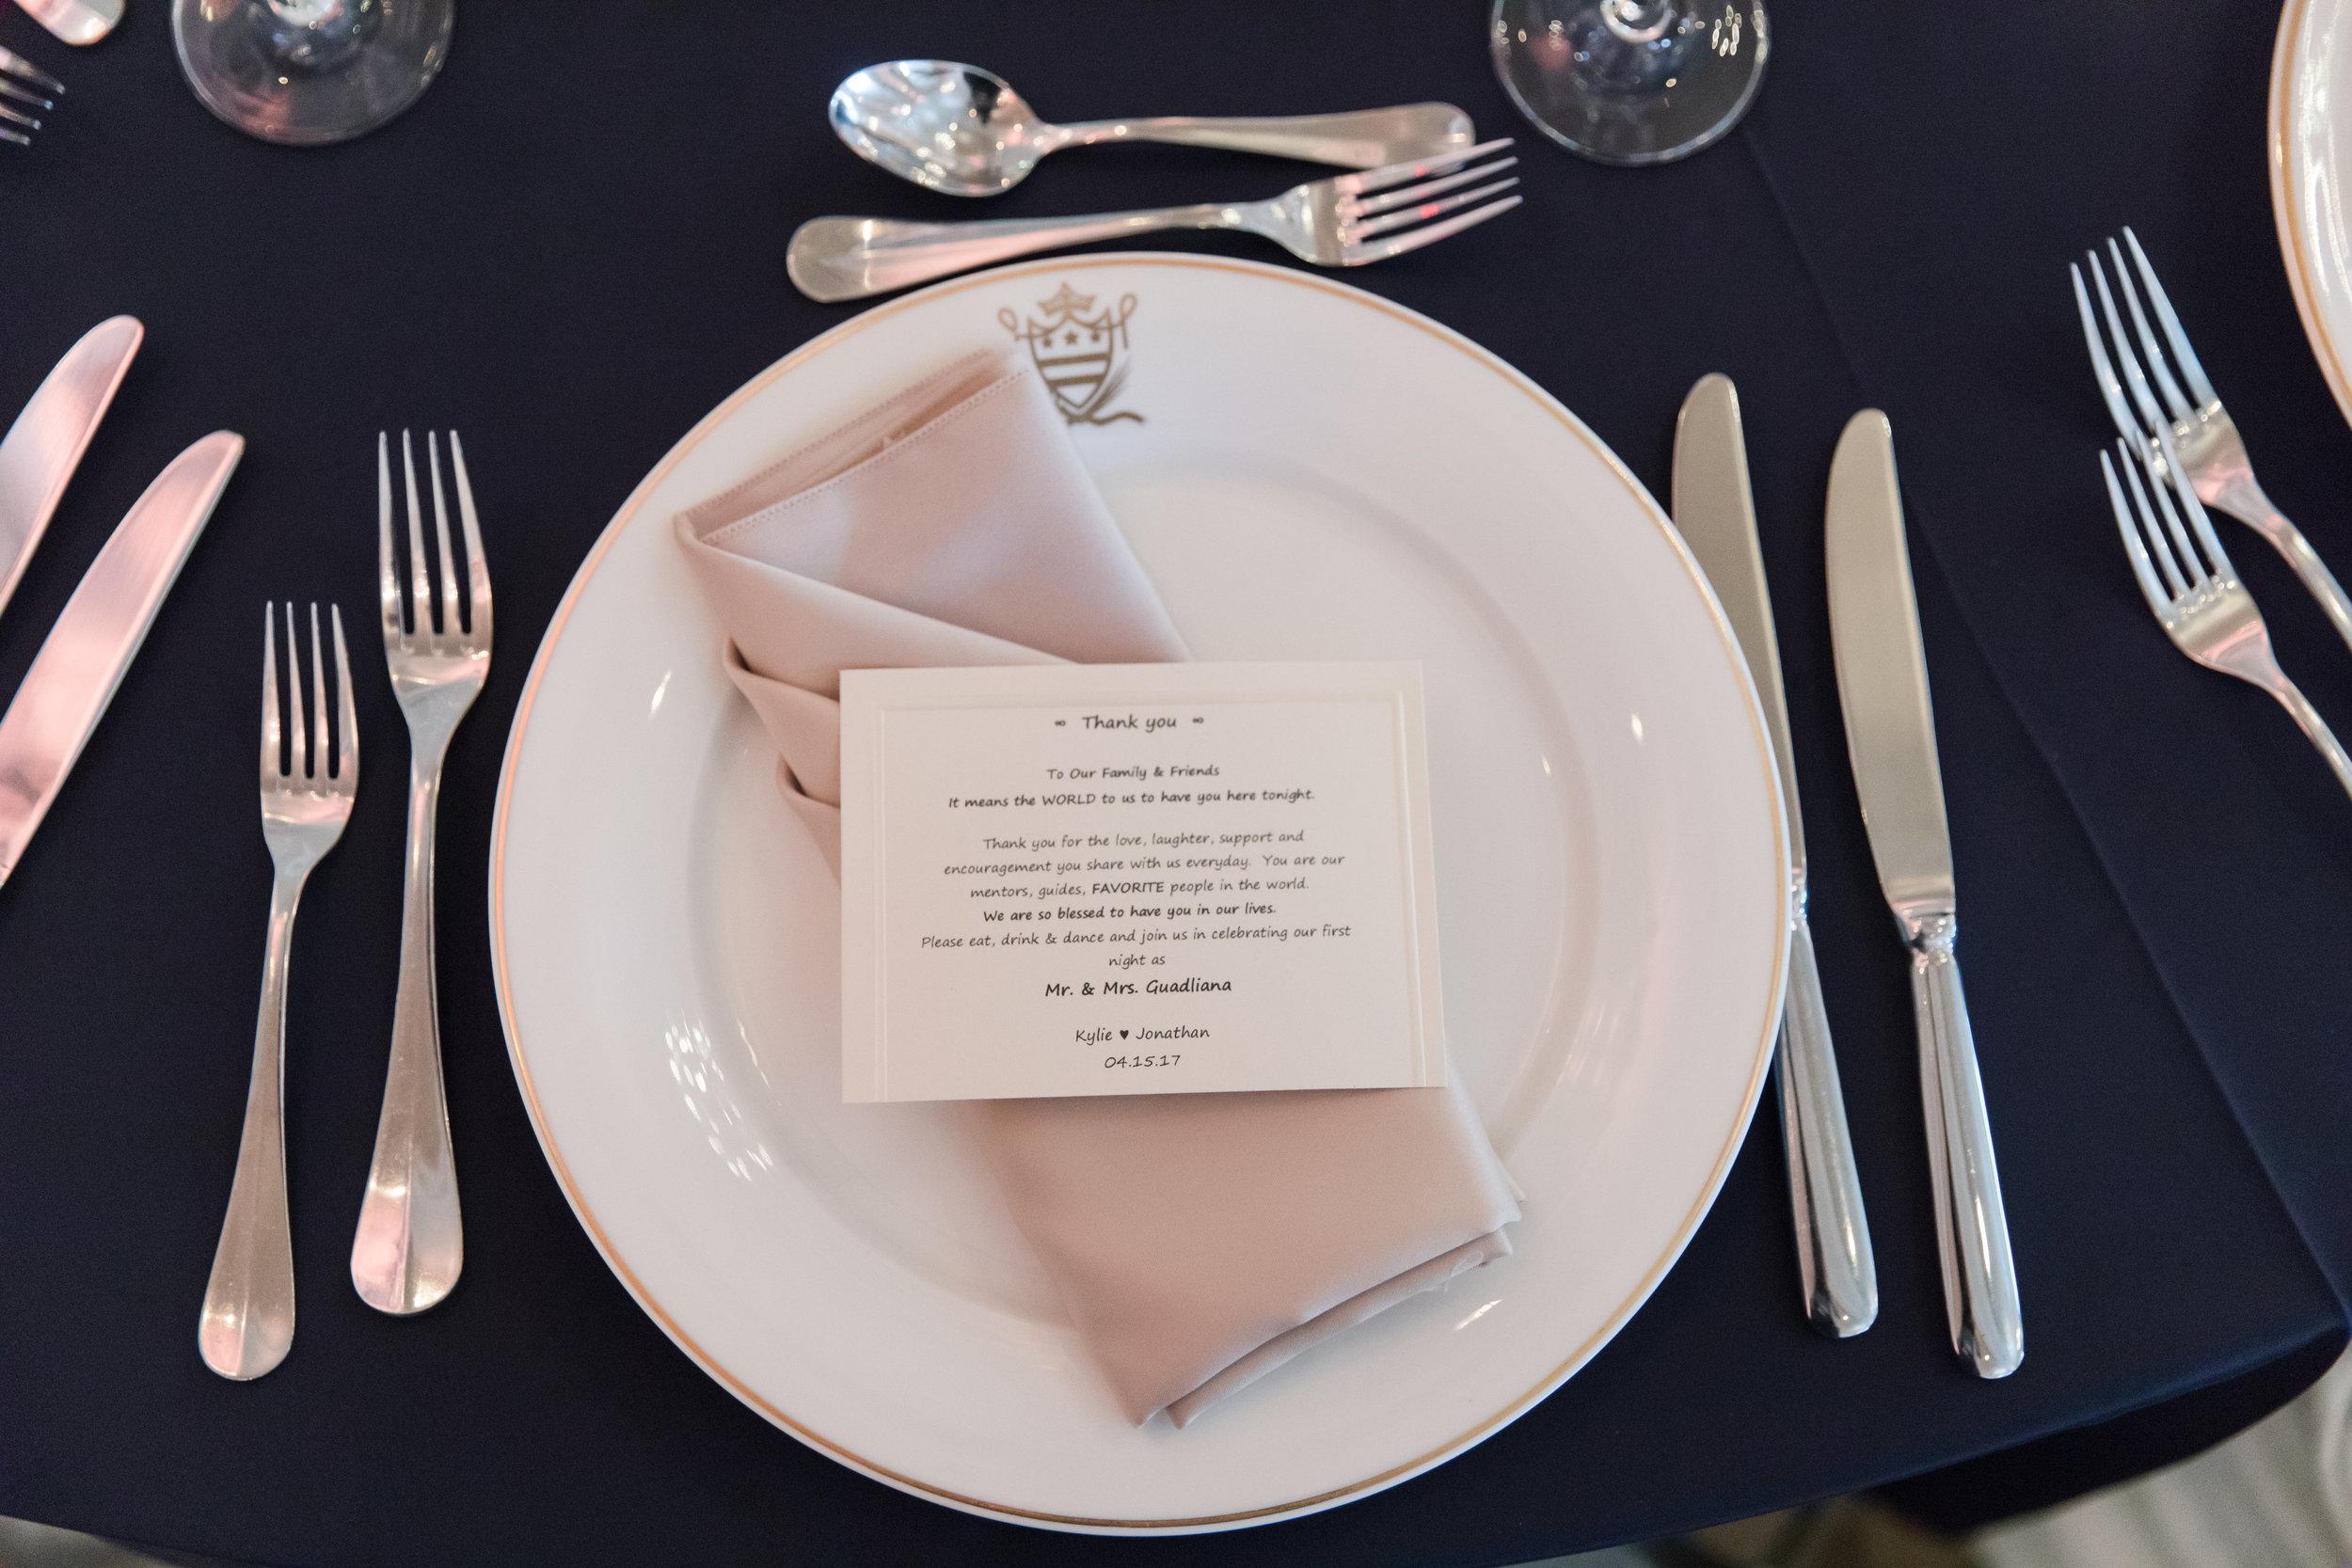 Place Setting Thank You Card - A Classic George Washington Hotel Wedding - Photography by Marirosa